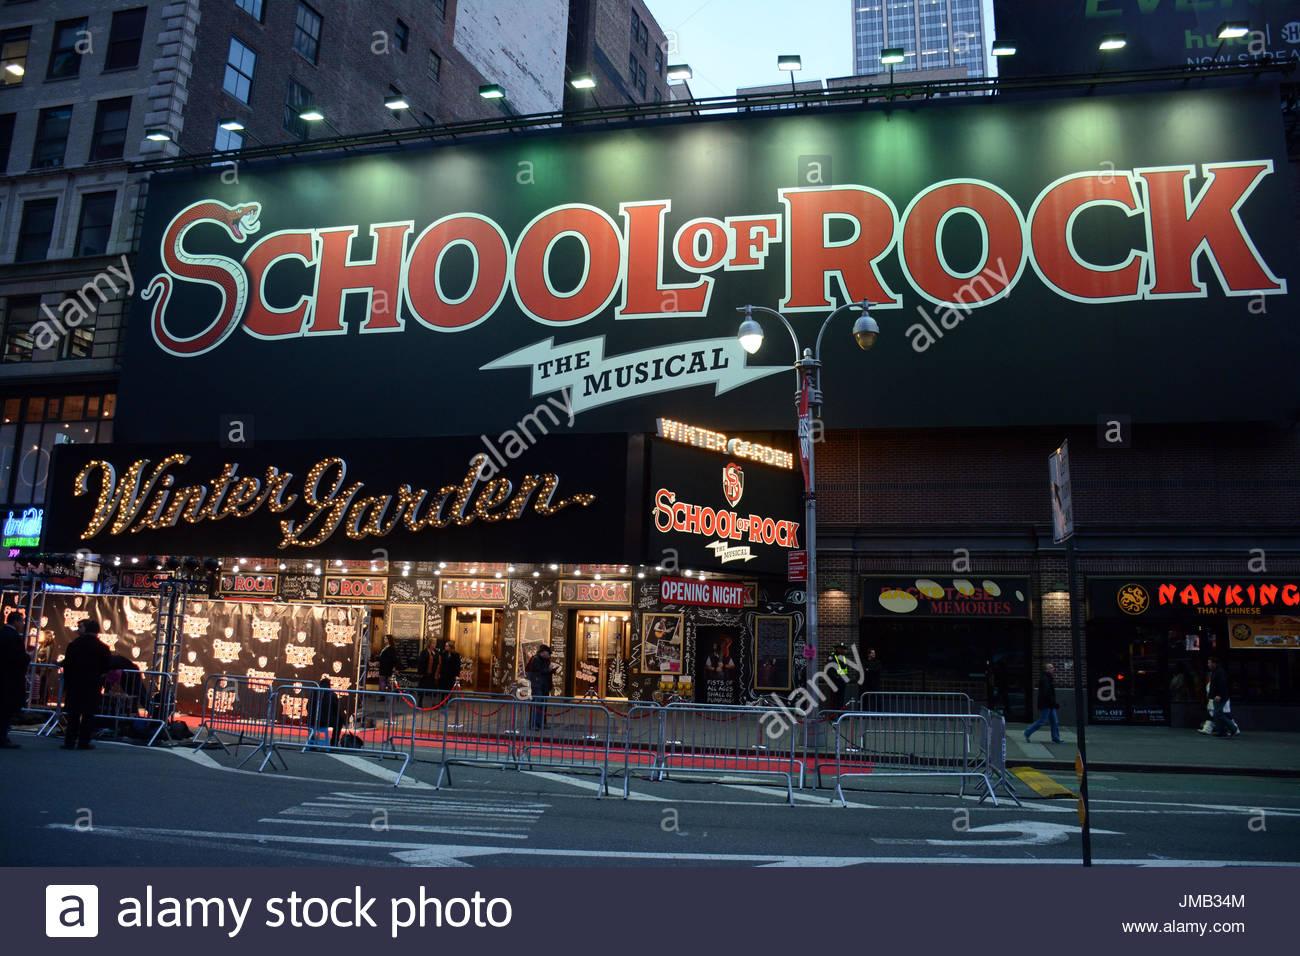 of rock opening night stock photos u0026 of rock opening